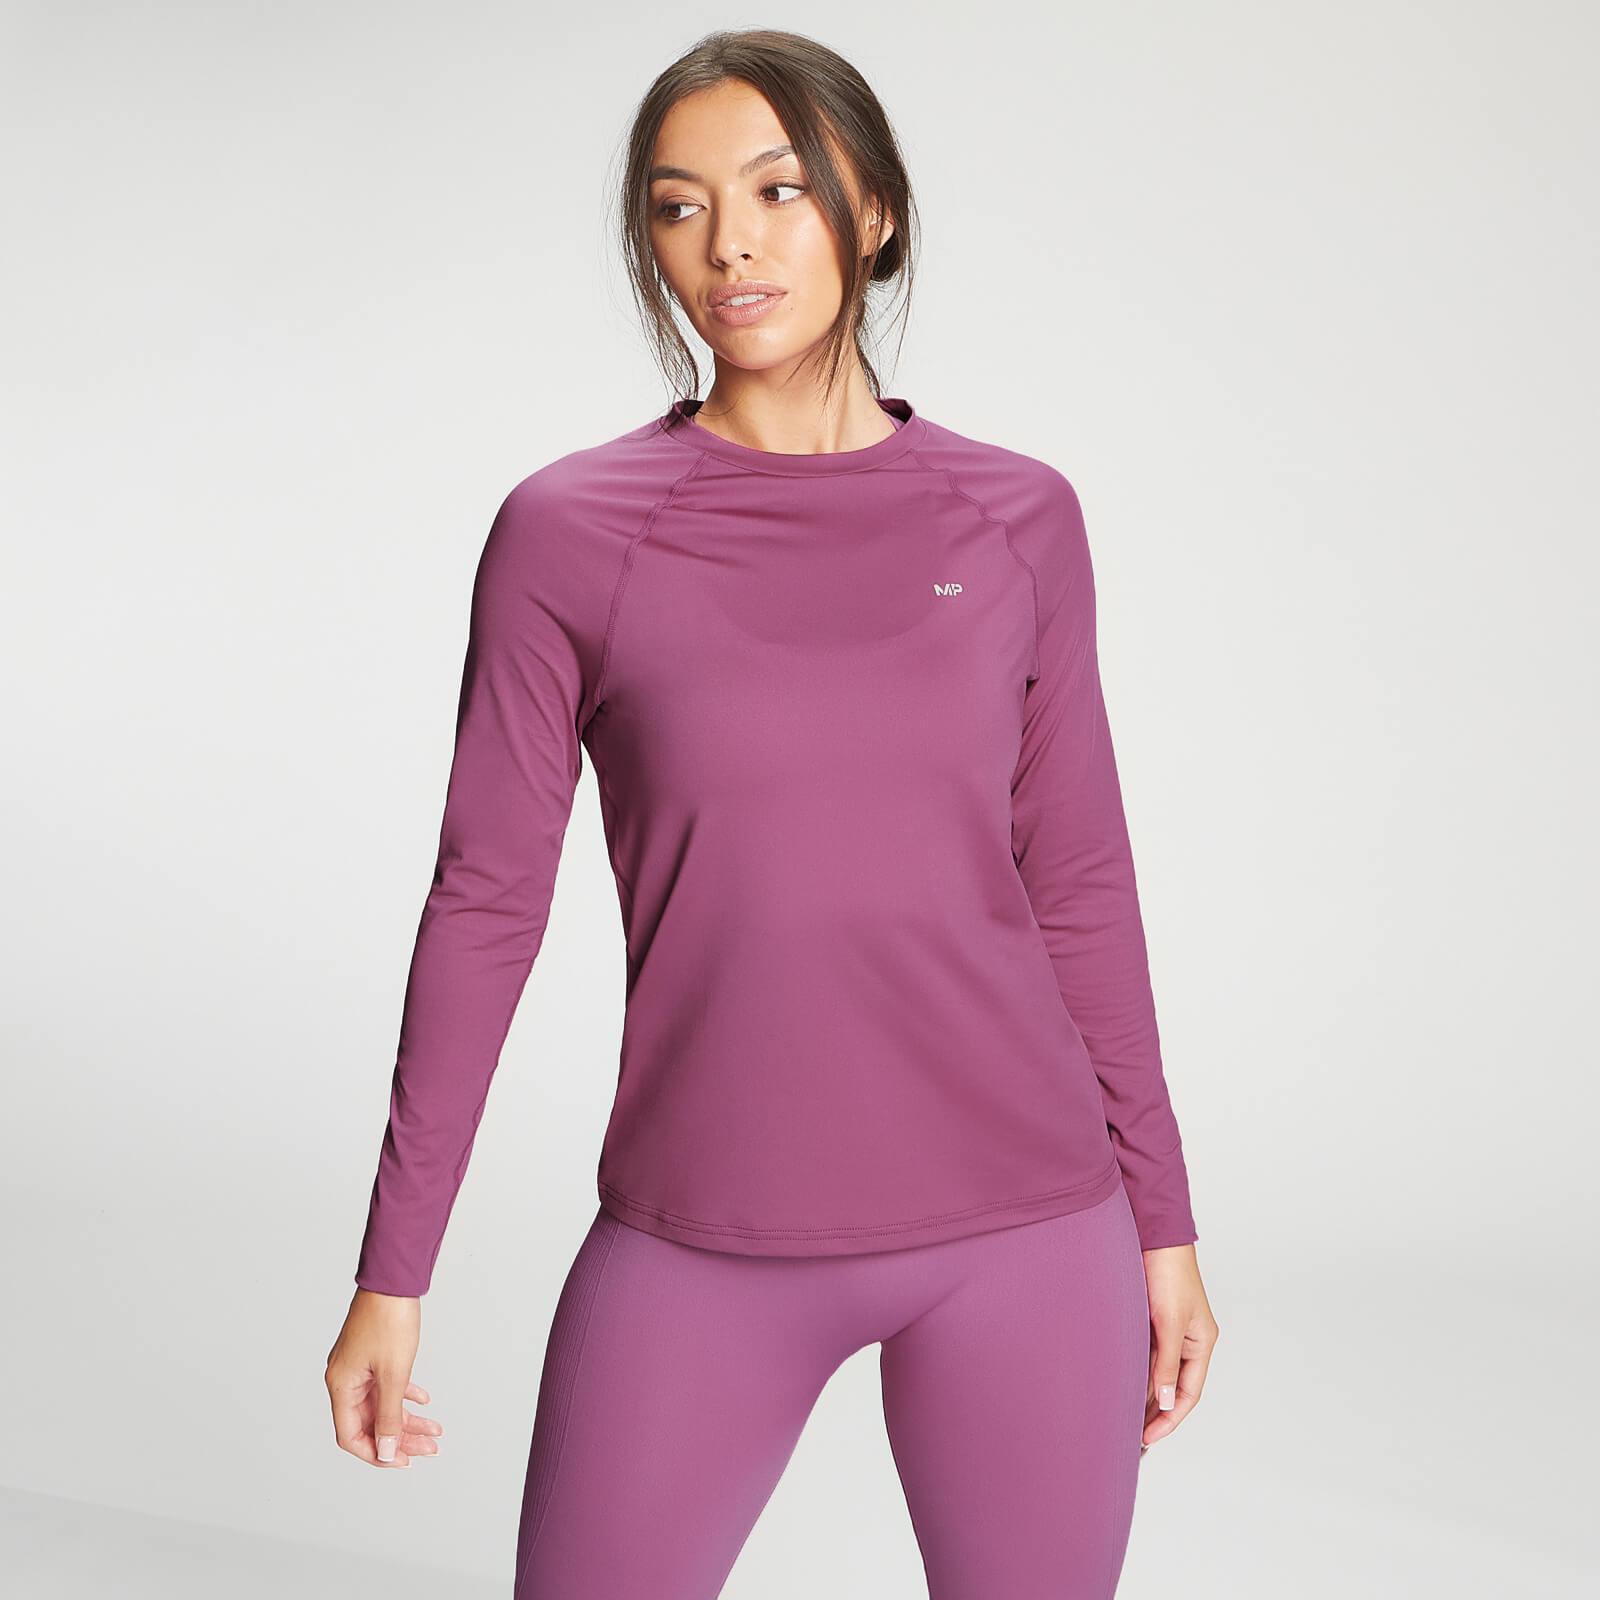 Купить MP Women's Essentials Training Slim Fit Long Sleeve Top - Orchid - XS, Myprotein International